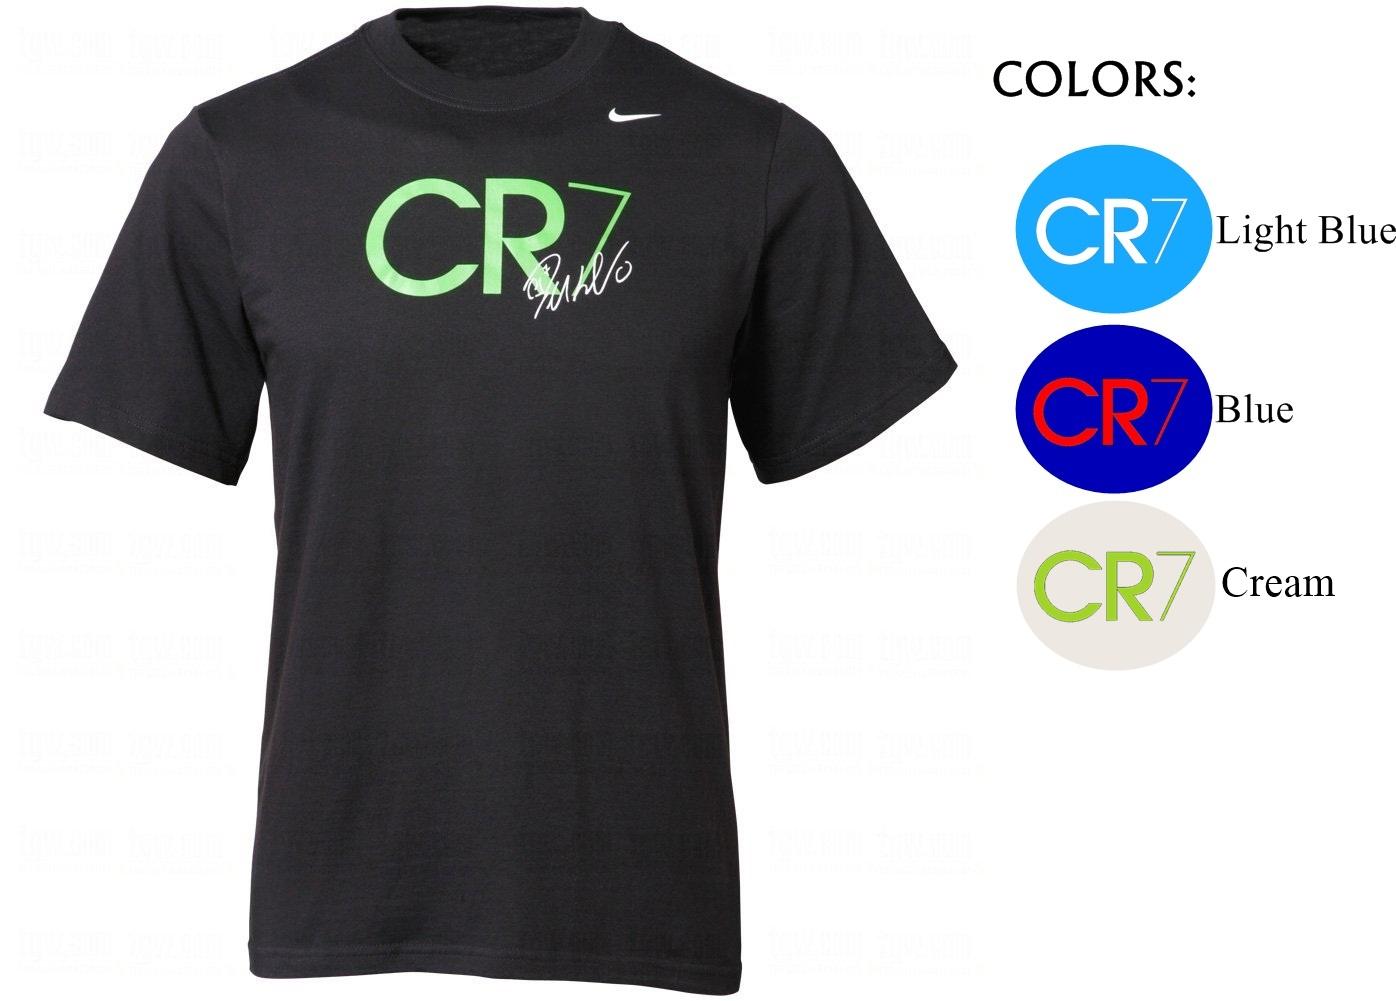 Jual T-shirt Nike CR7 Original - Zadisa | Tokopedia